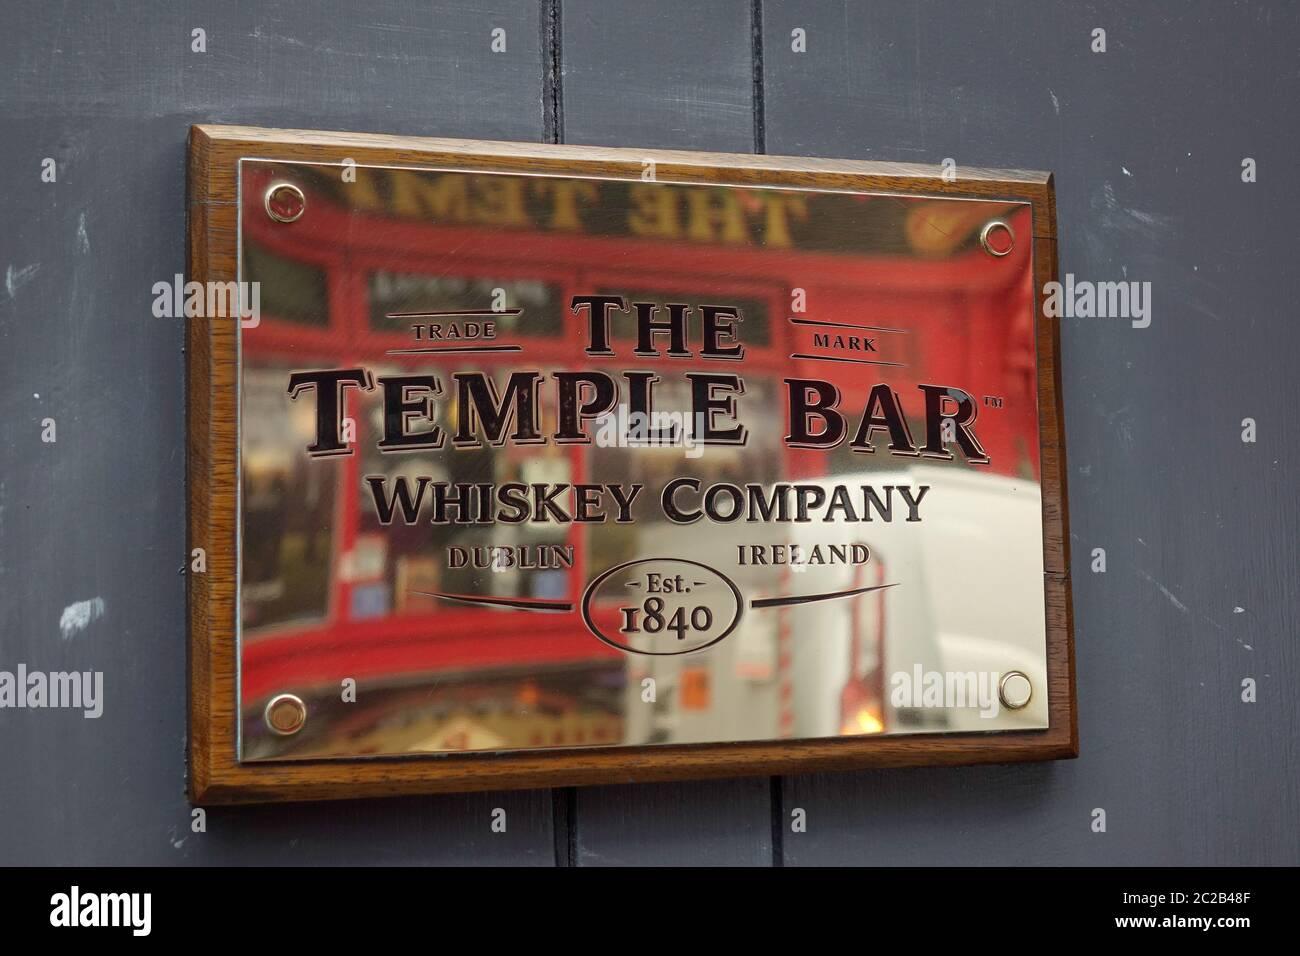 the-temple-bar-whiskey-company-brass-plaque-sign-dublin-ireland-2C2B48F.jpg